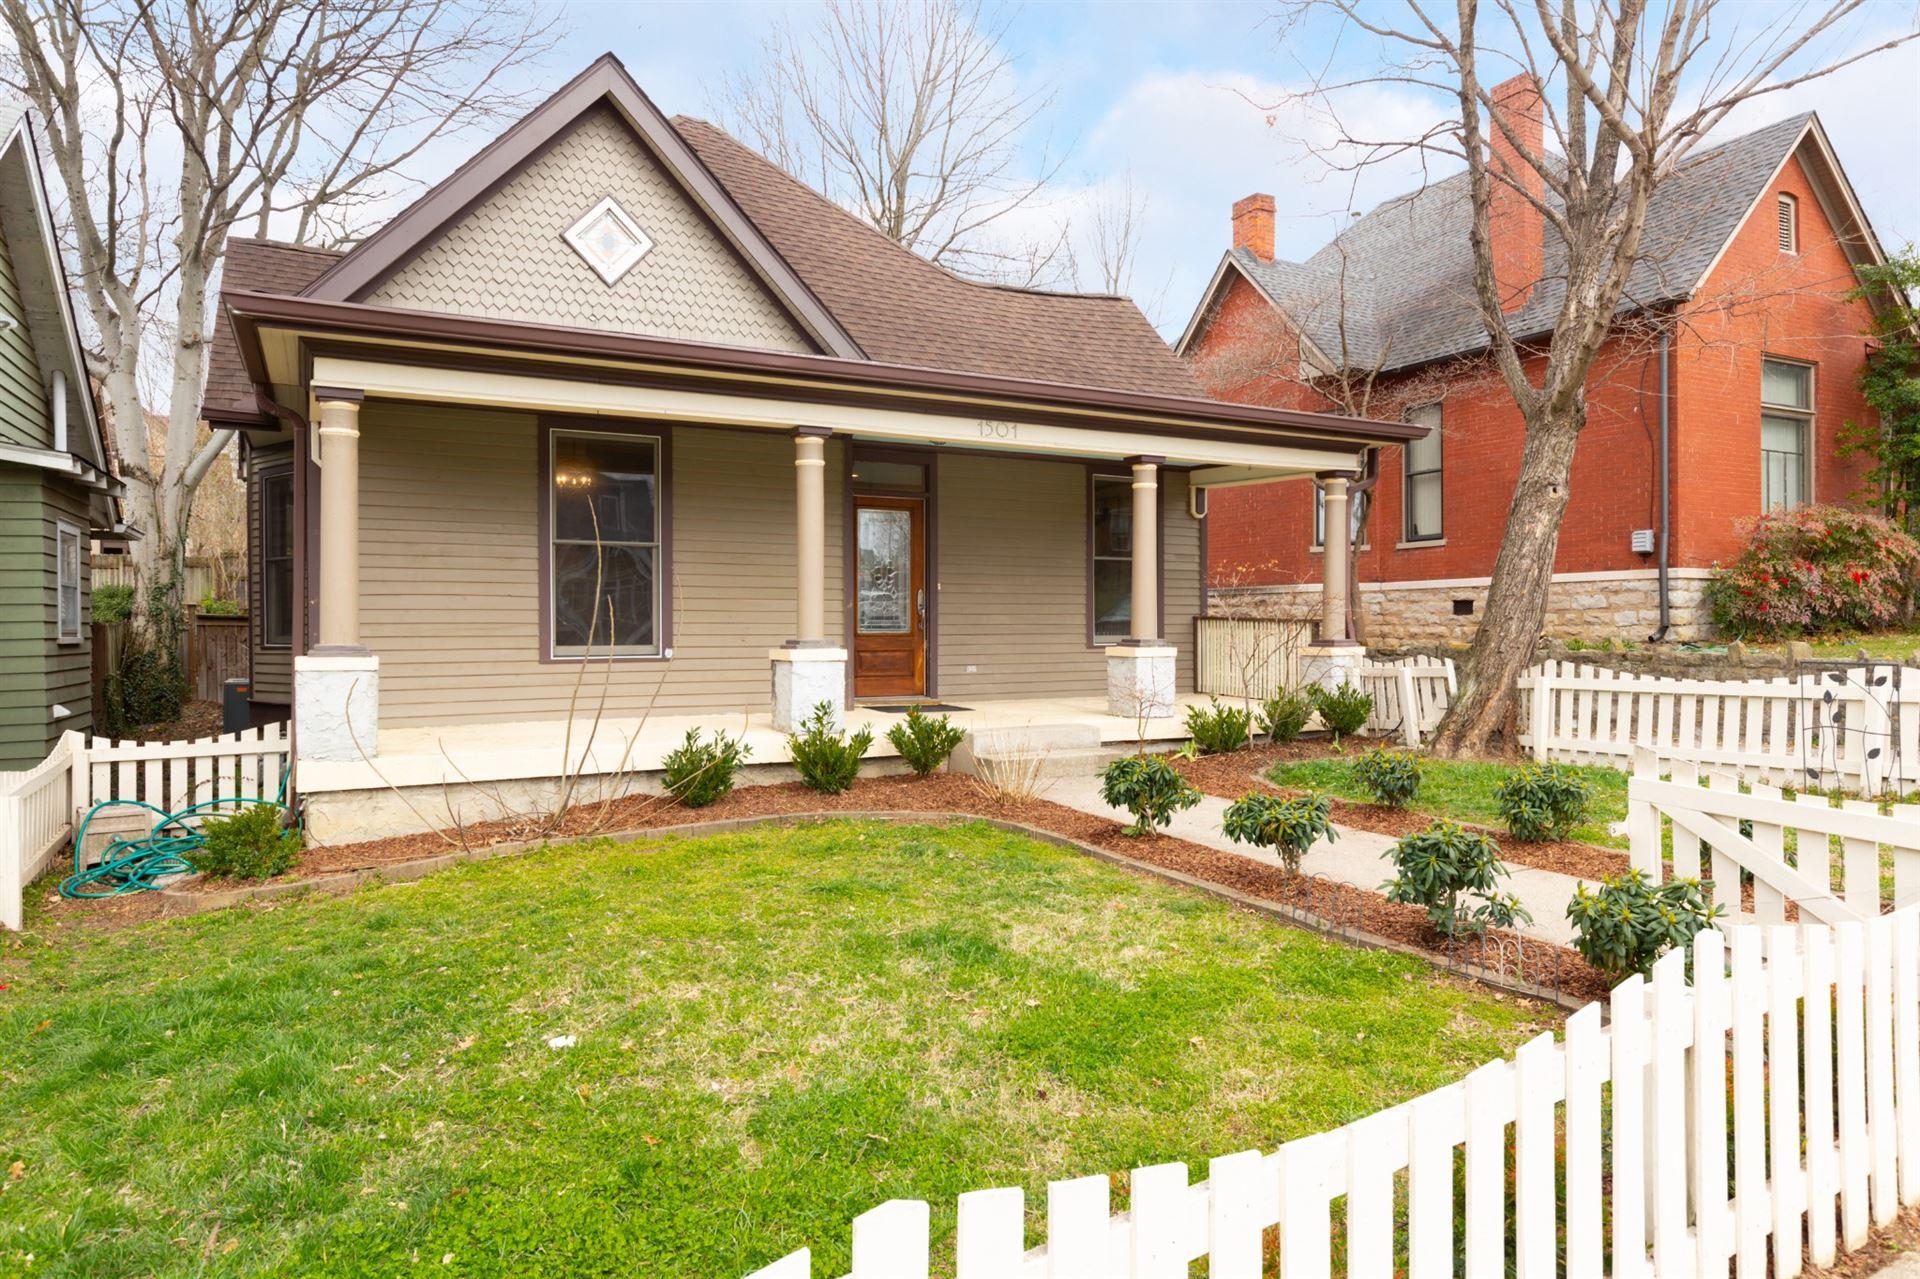 1501 Woodland St, Nashville, TN 37206 - MLS#: 2234842